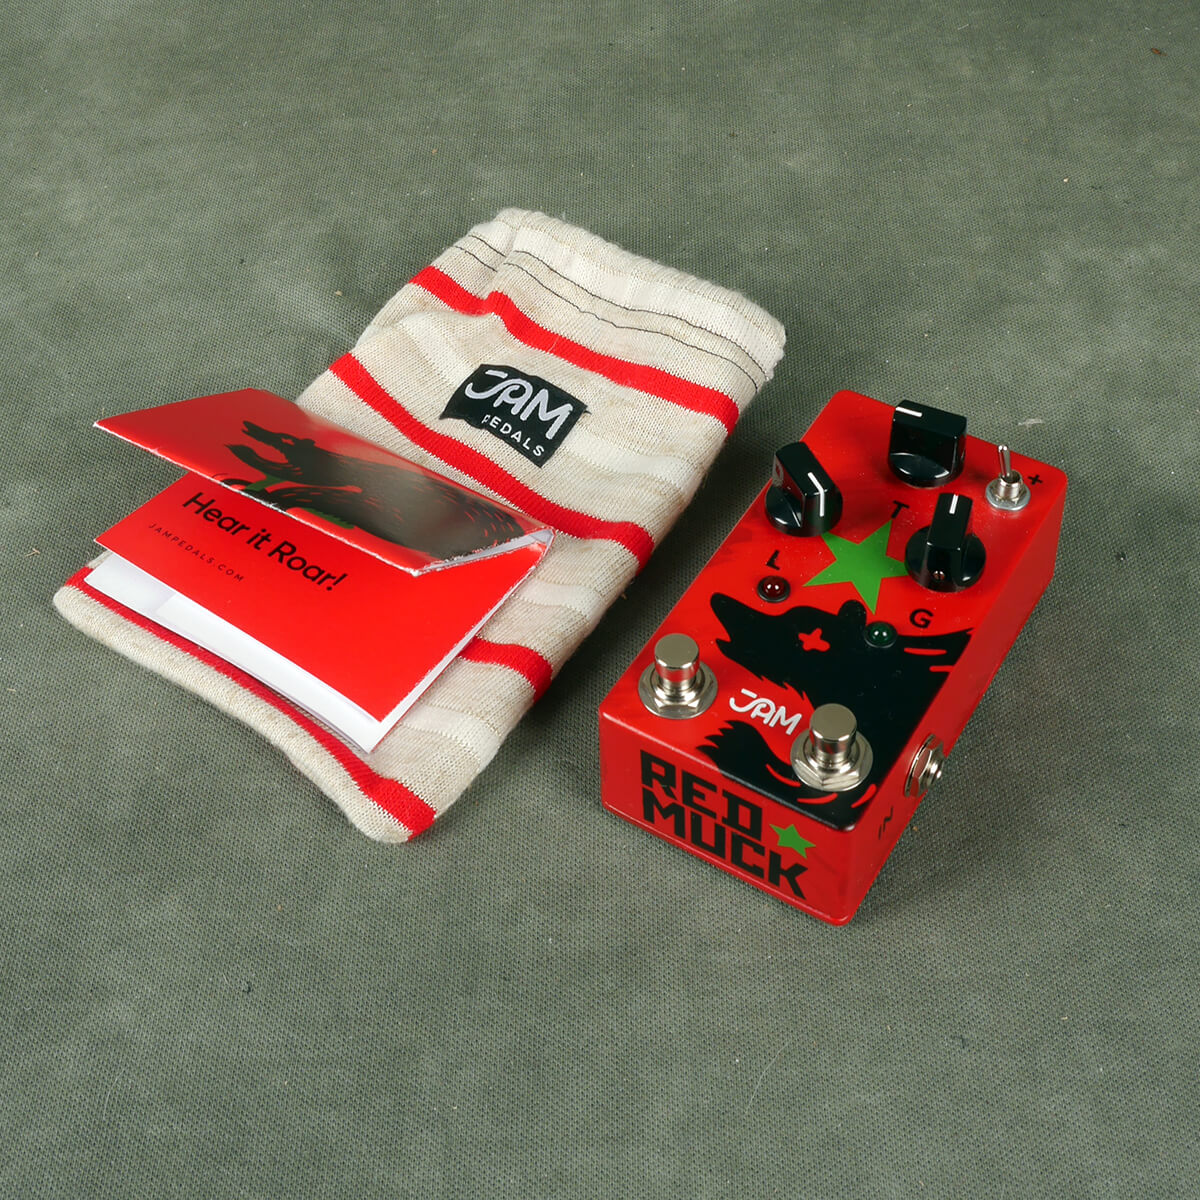 Jam Pedals Red Muck Fuzz FX Pedal w/Bag - 2nd Hand